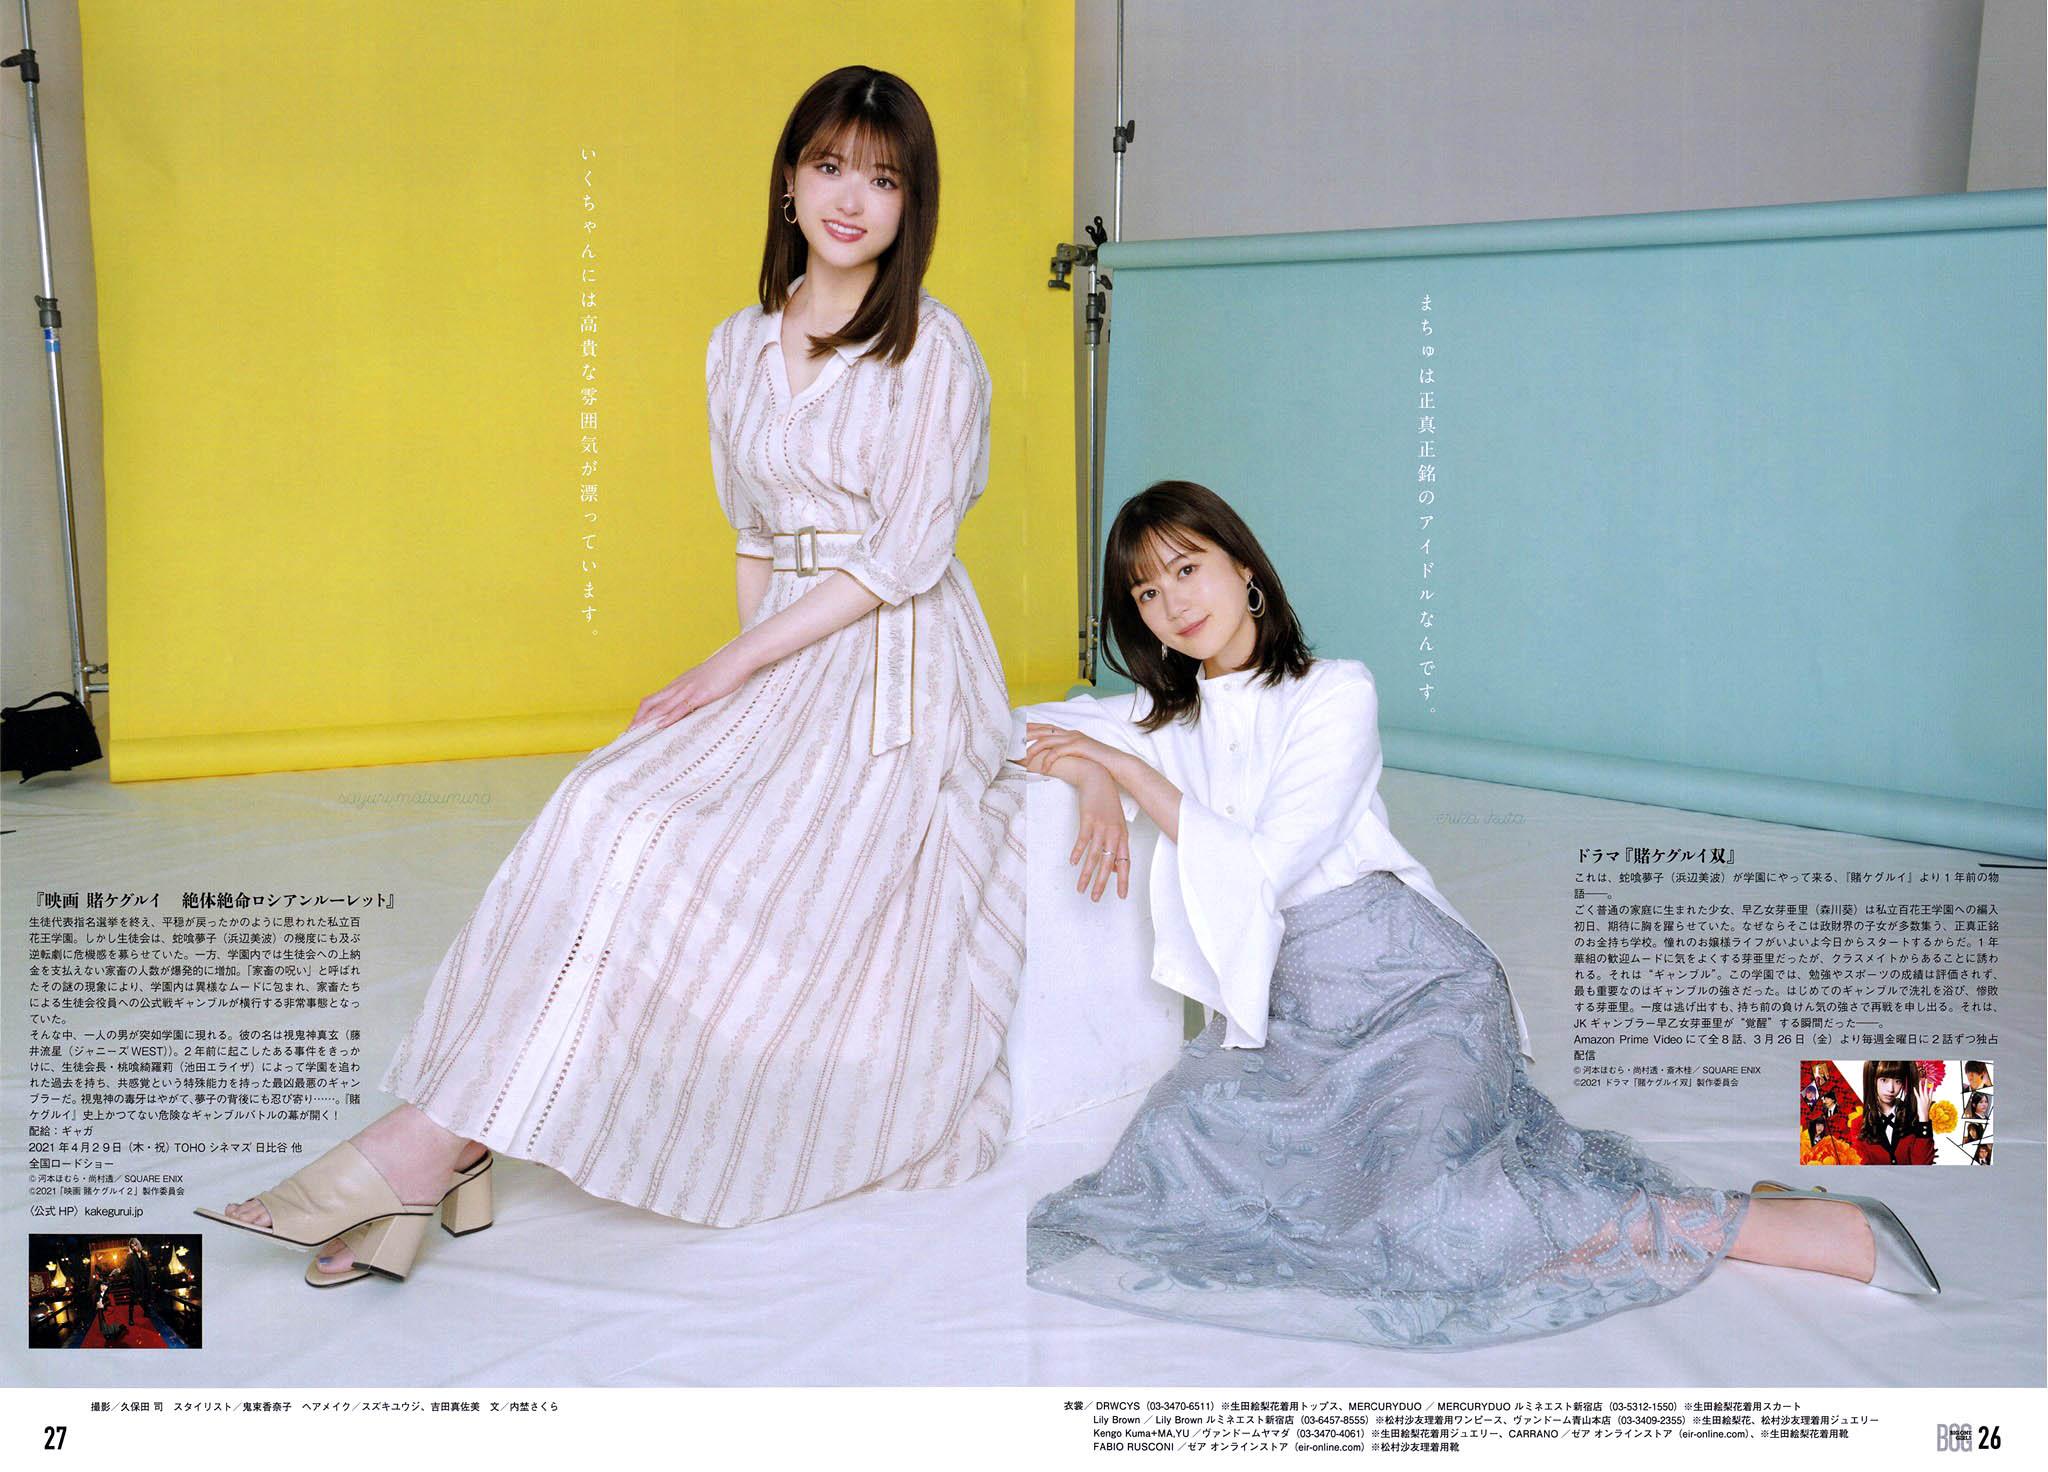 EIkuta SMatsumura Big One Girls 2105 02.jpg